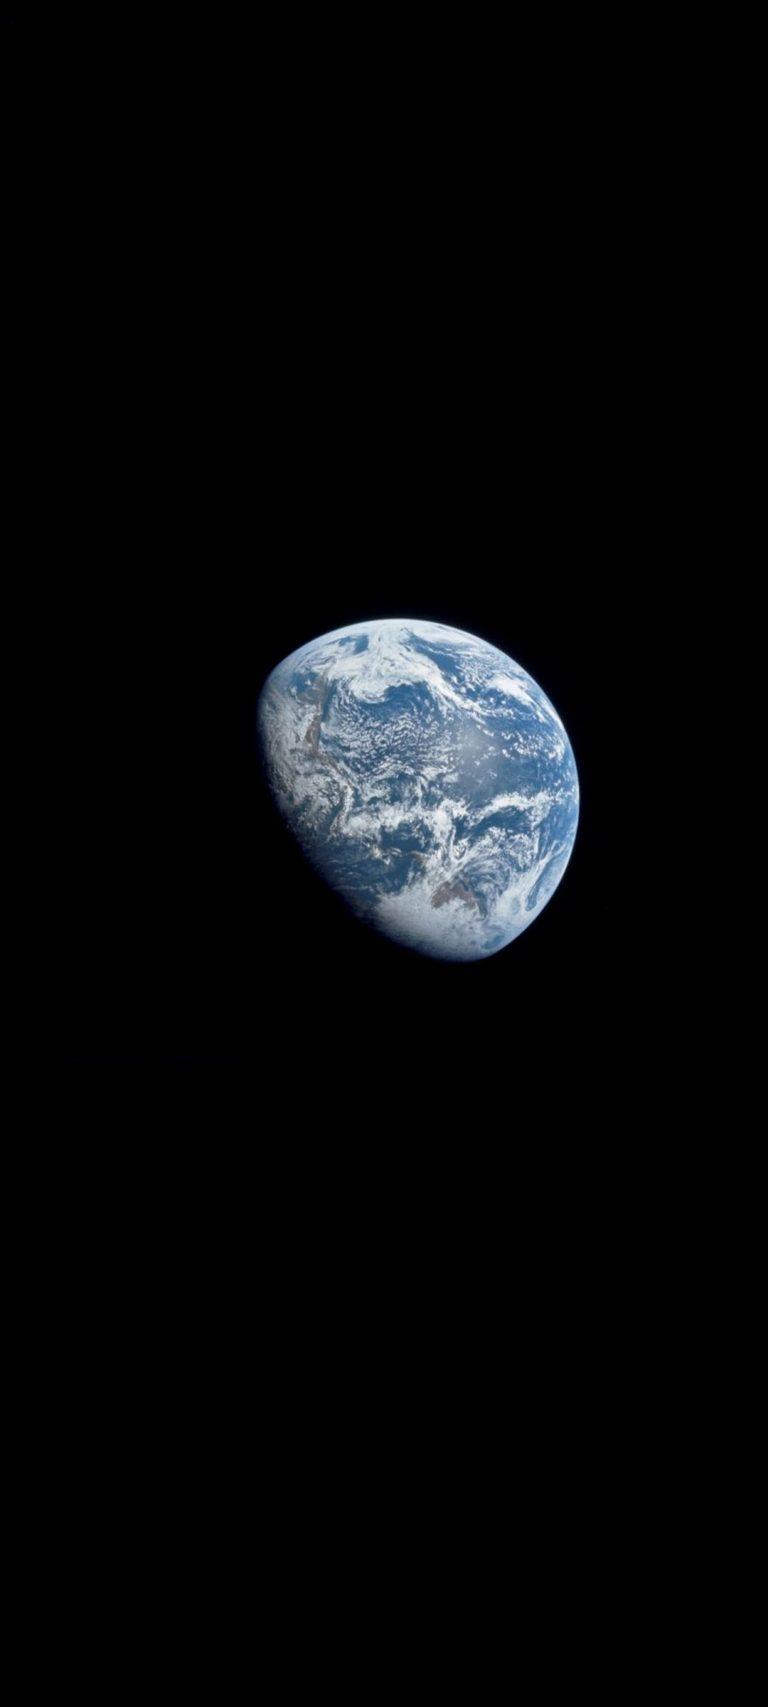 1080×2400 wallpaper: Space Earth Shadow